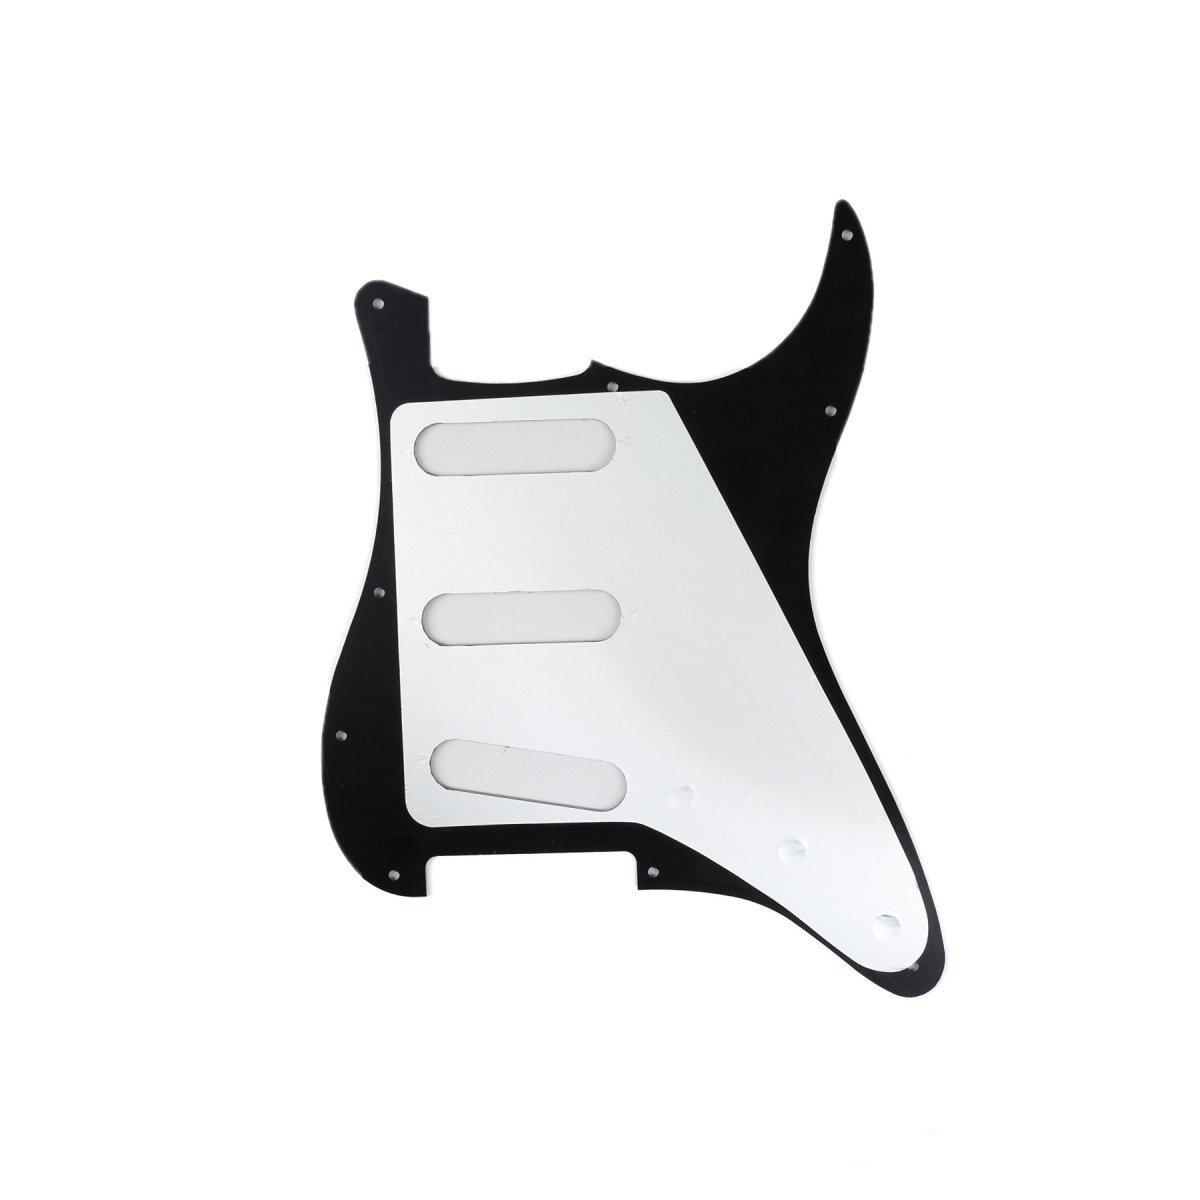 Pickguard Left Hand Handed Strat Fender Stratocaster USA//MIM Black 3 Ply Sss